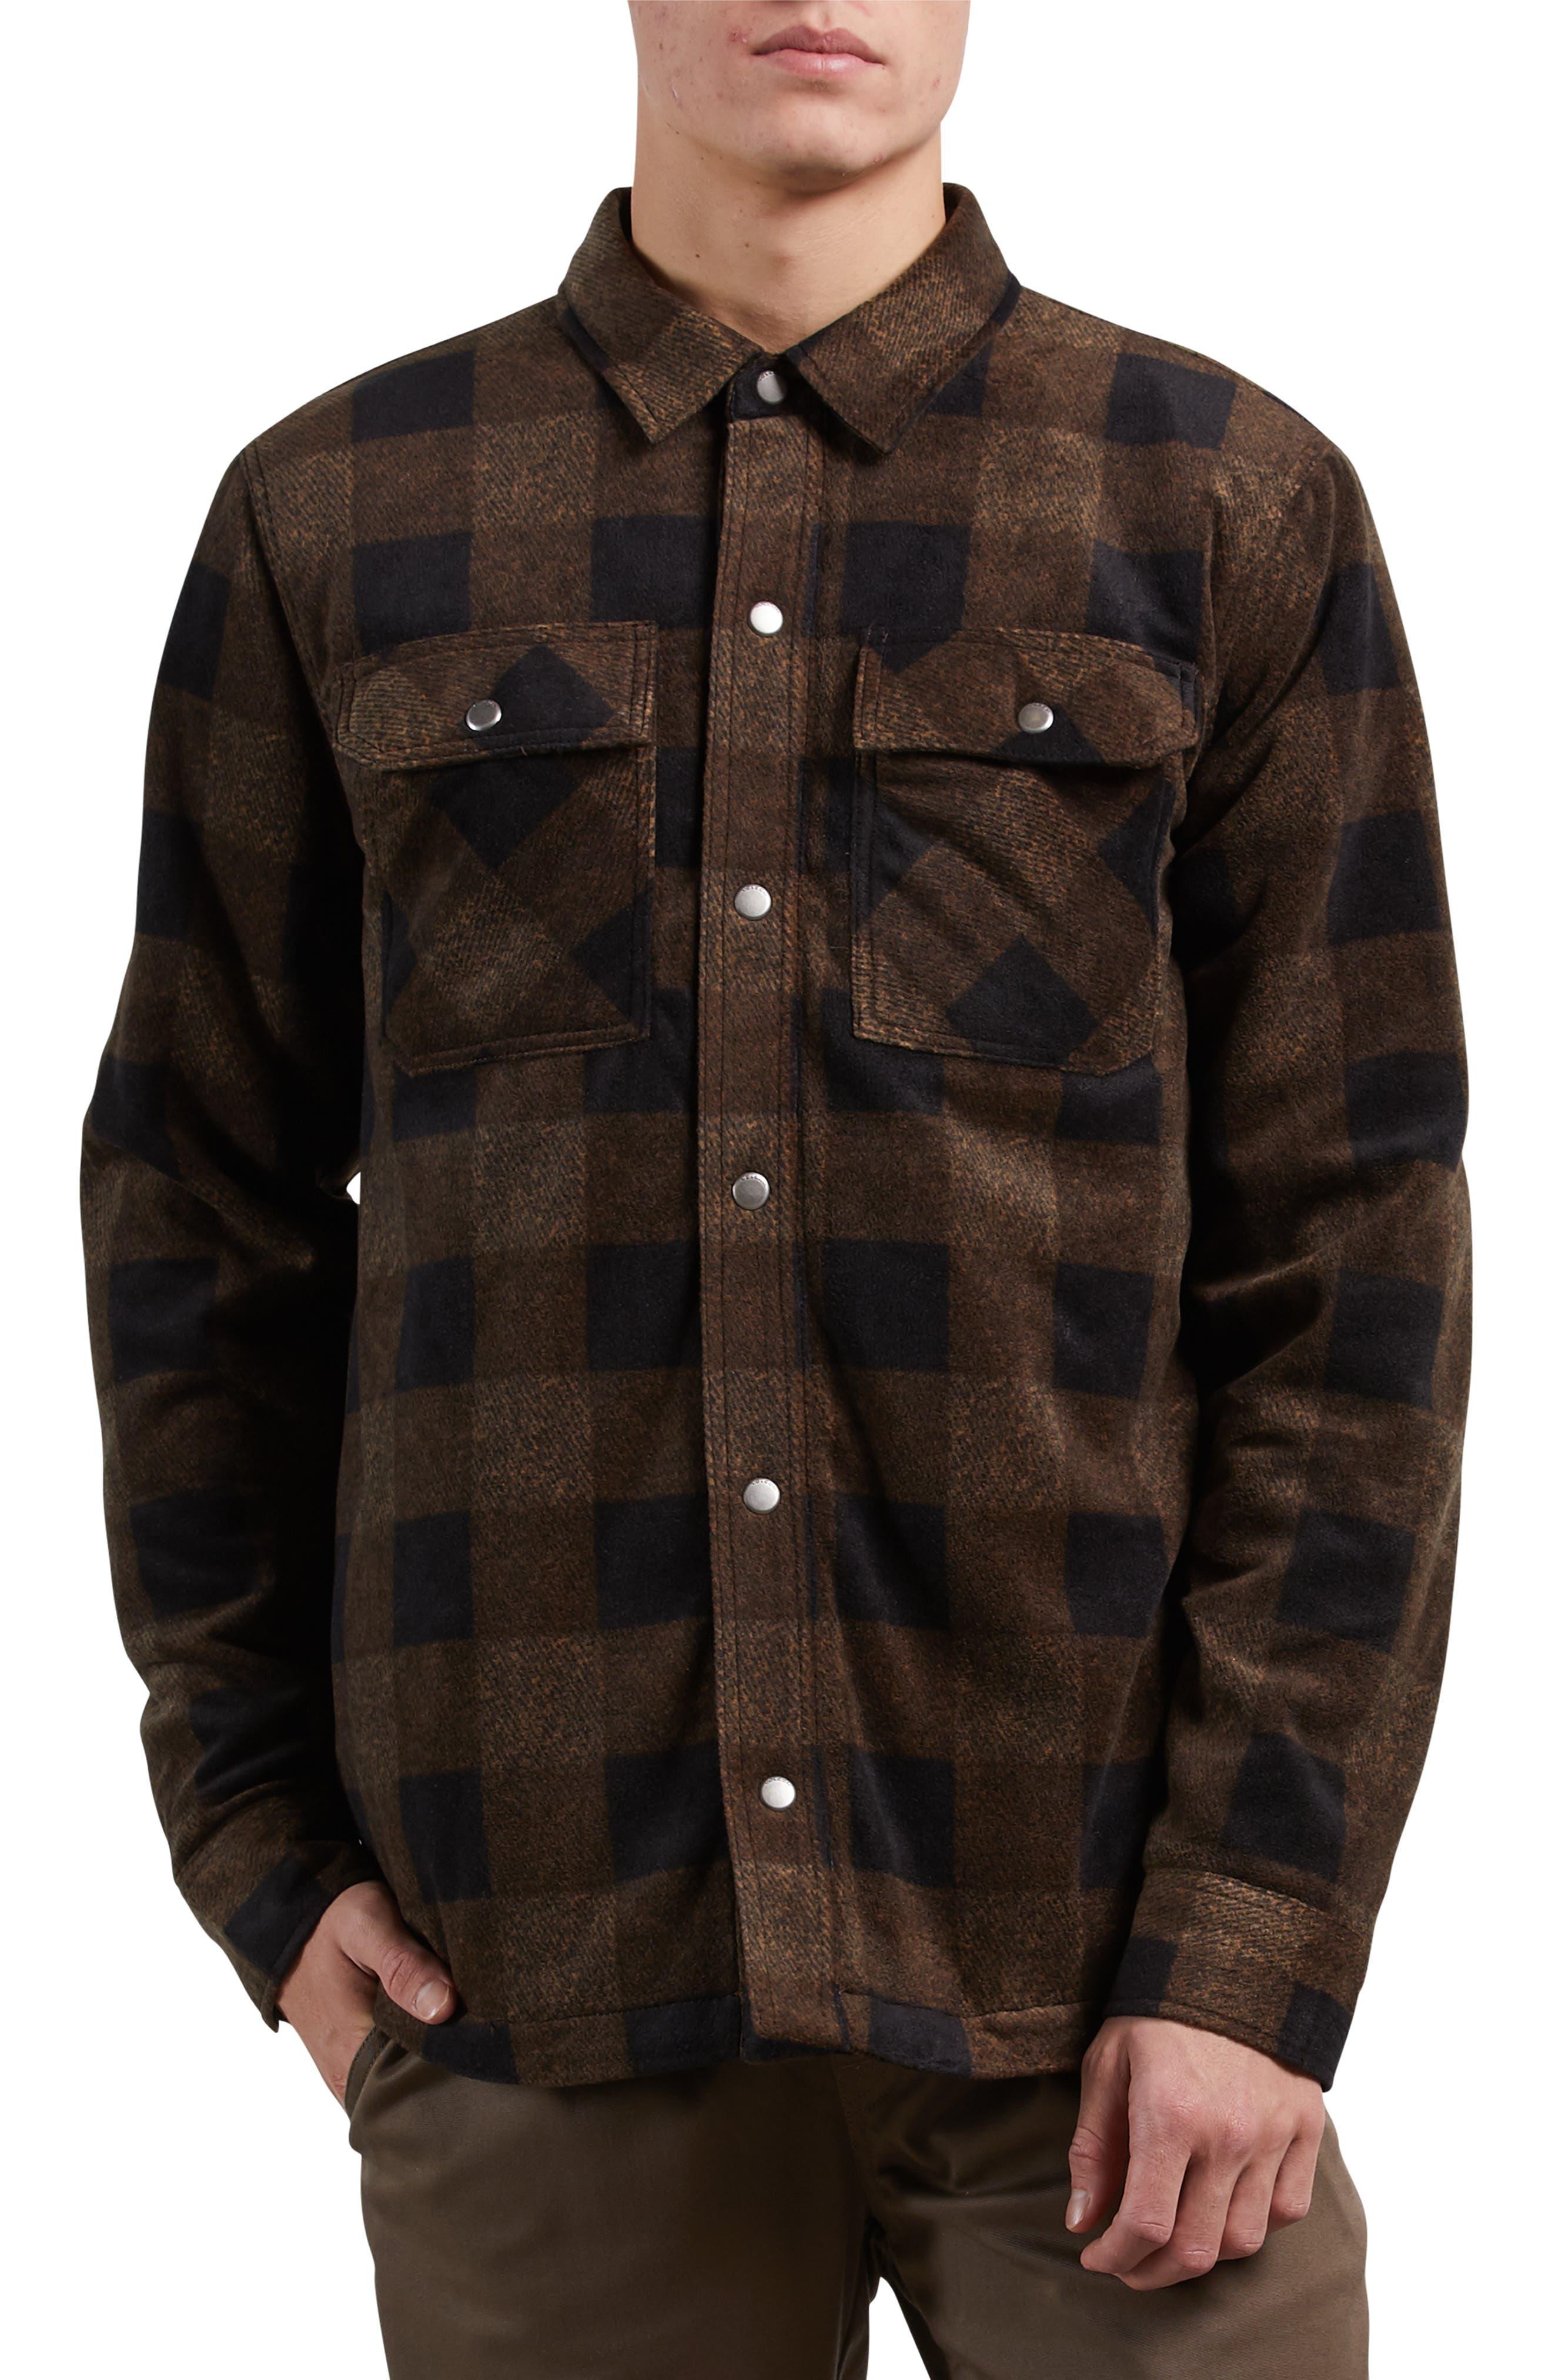 Bower Check Print Fleece Jacket,                             Alternate thumbnail 3, color,                             800